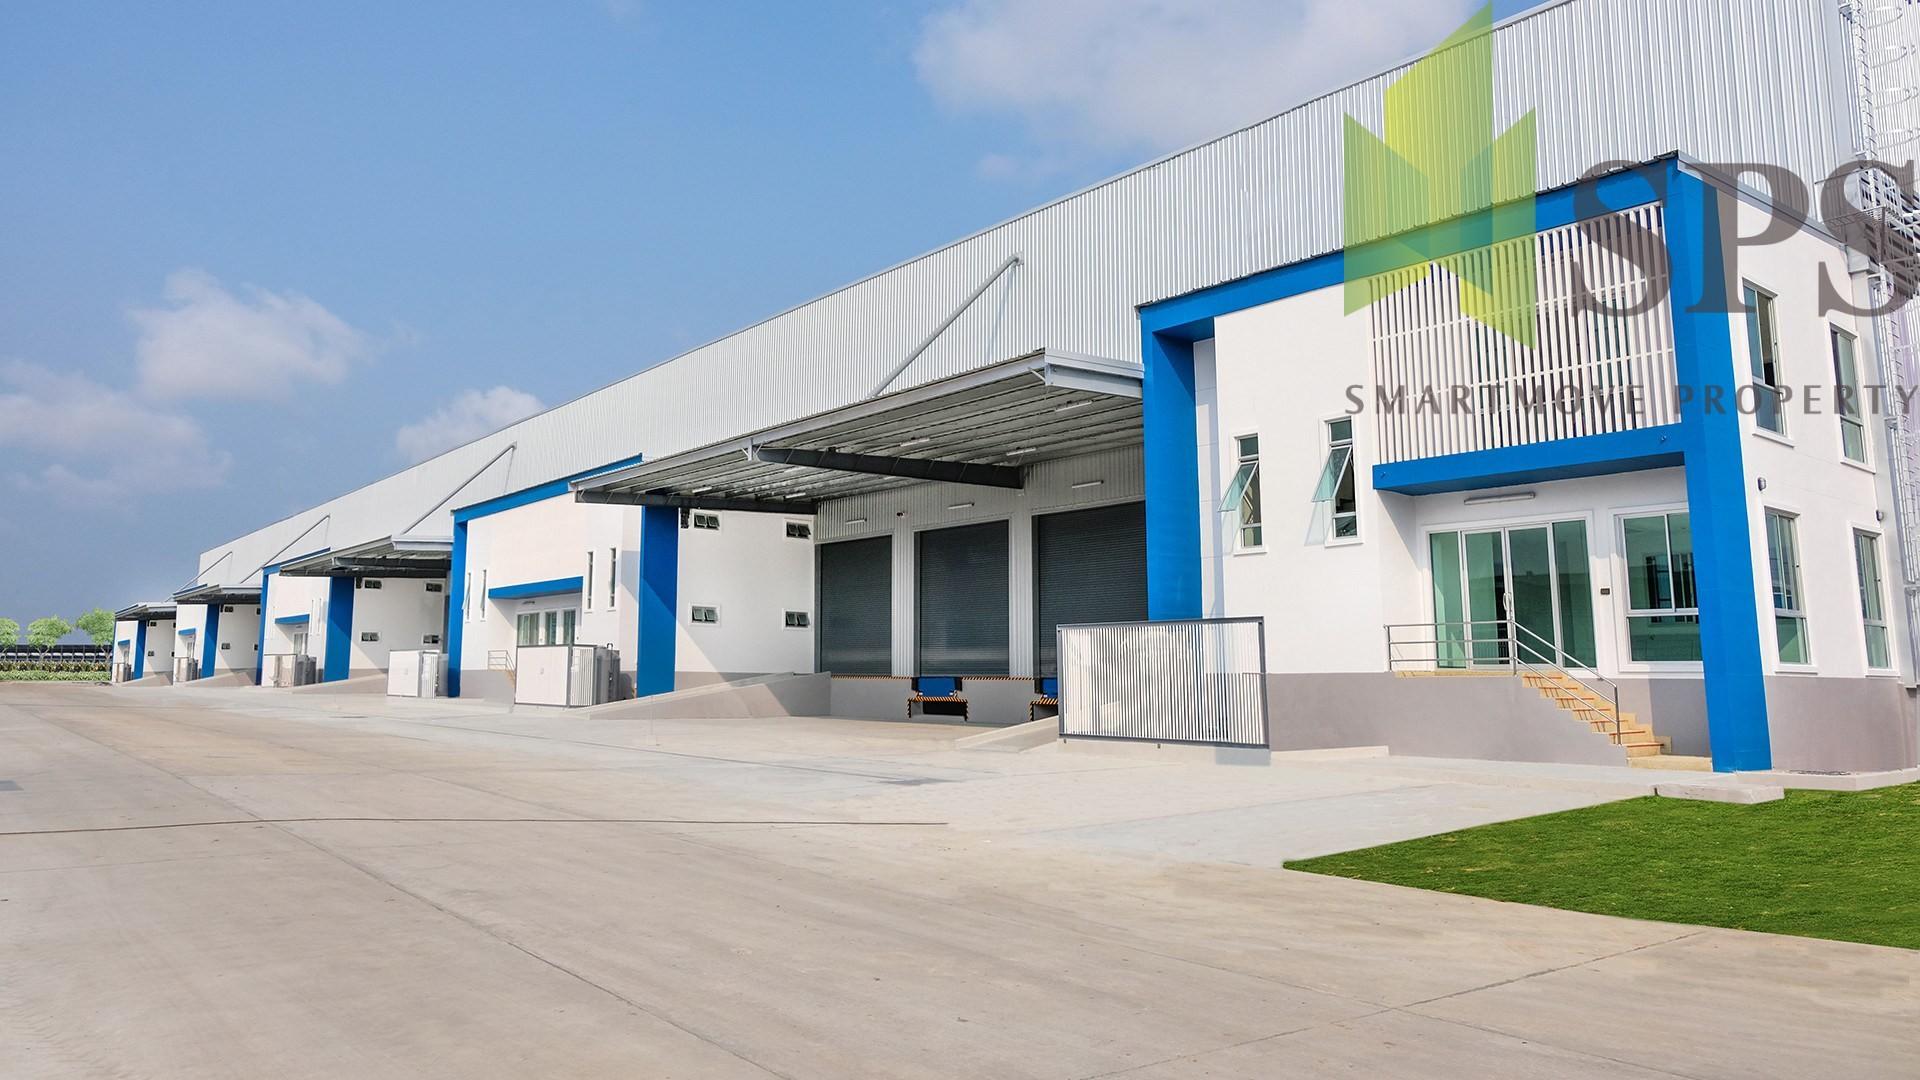 Raised Floor Factory, Warehouse in Free Zone for RENT at Bangna-Trad Road, Km 23 / โกดัง, โรงงาน พื้นยก ในเขตฟรีโซน สำหรับเช่า ที่ บางนาตราด กม.23 (Property ID: SPS-PPW150)